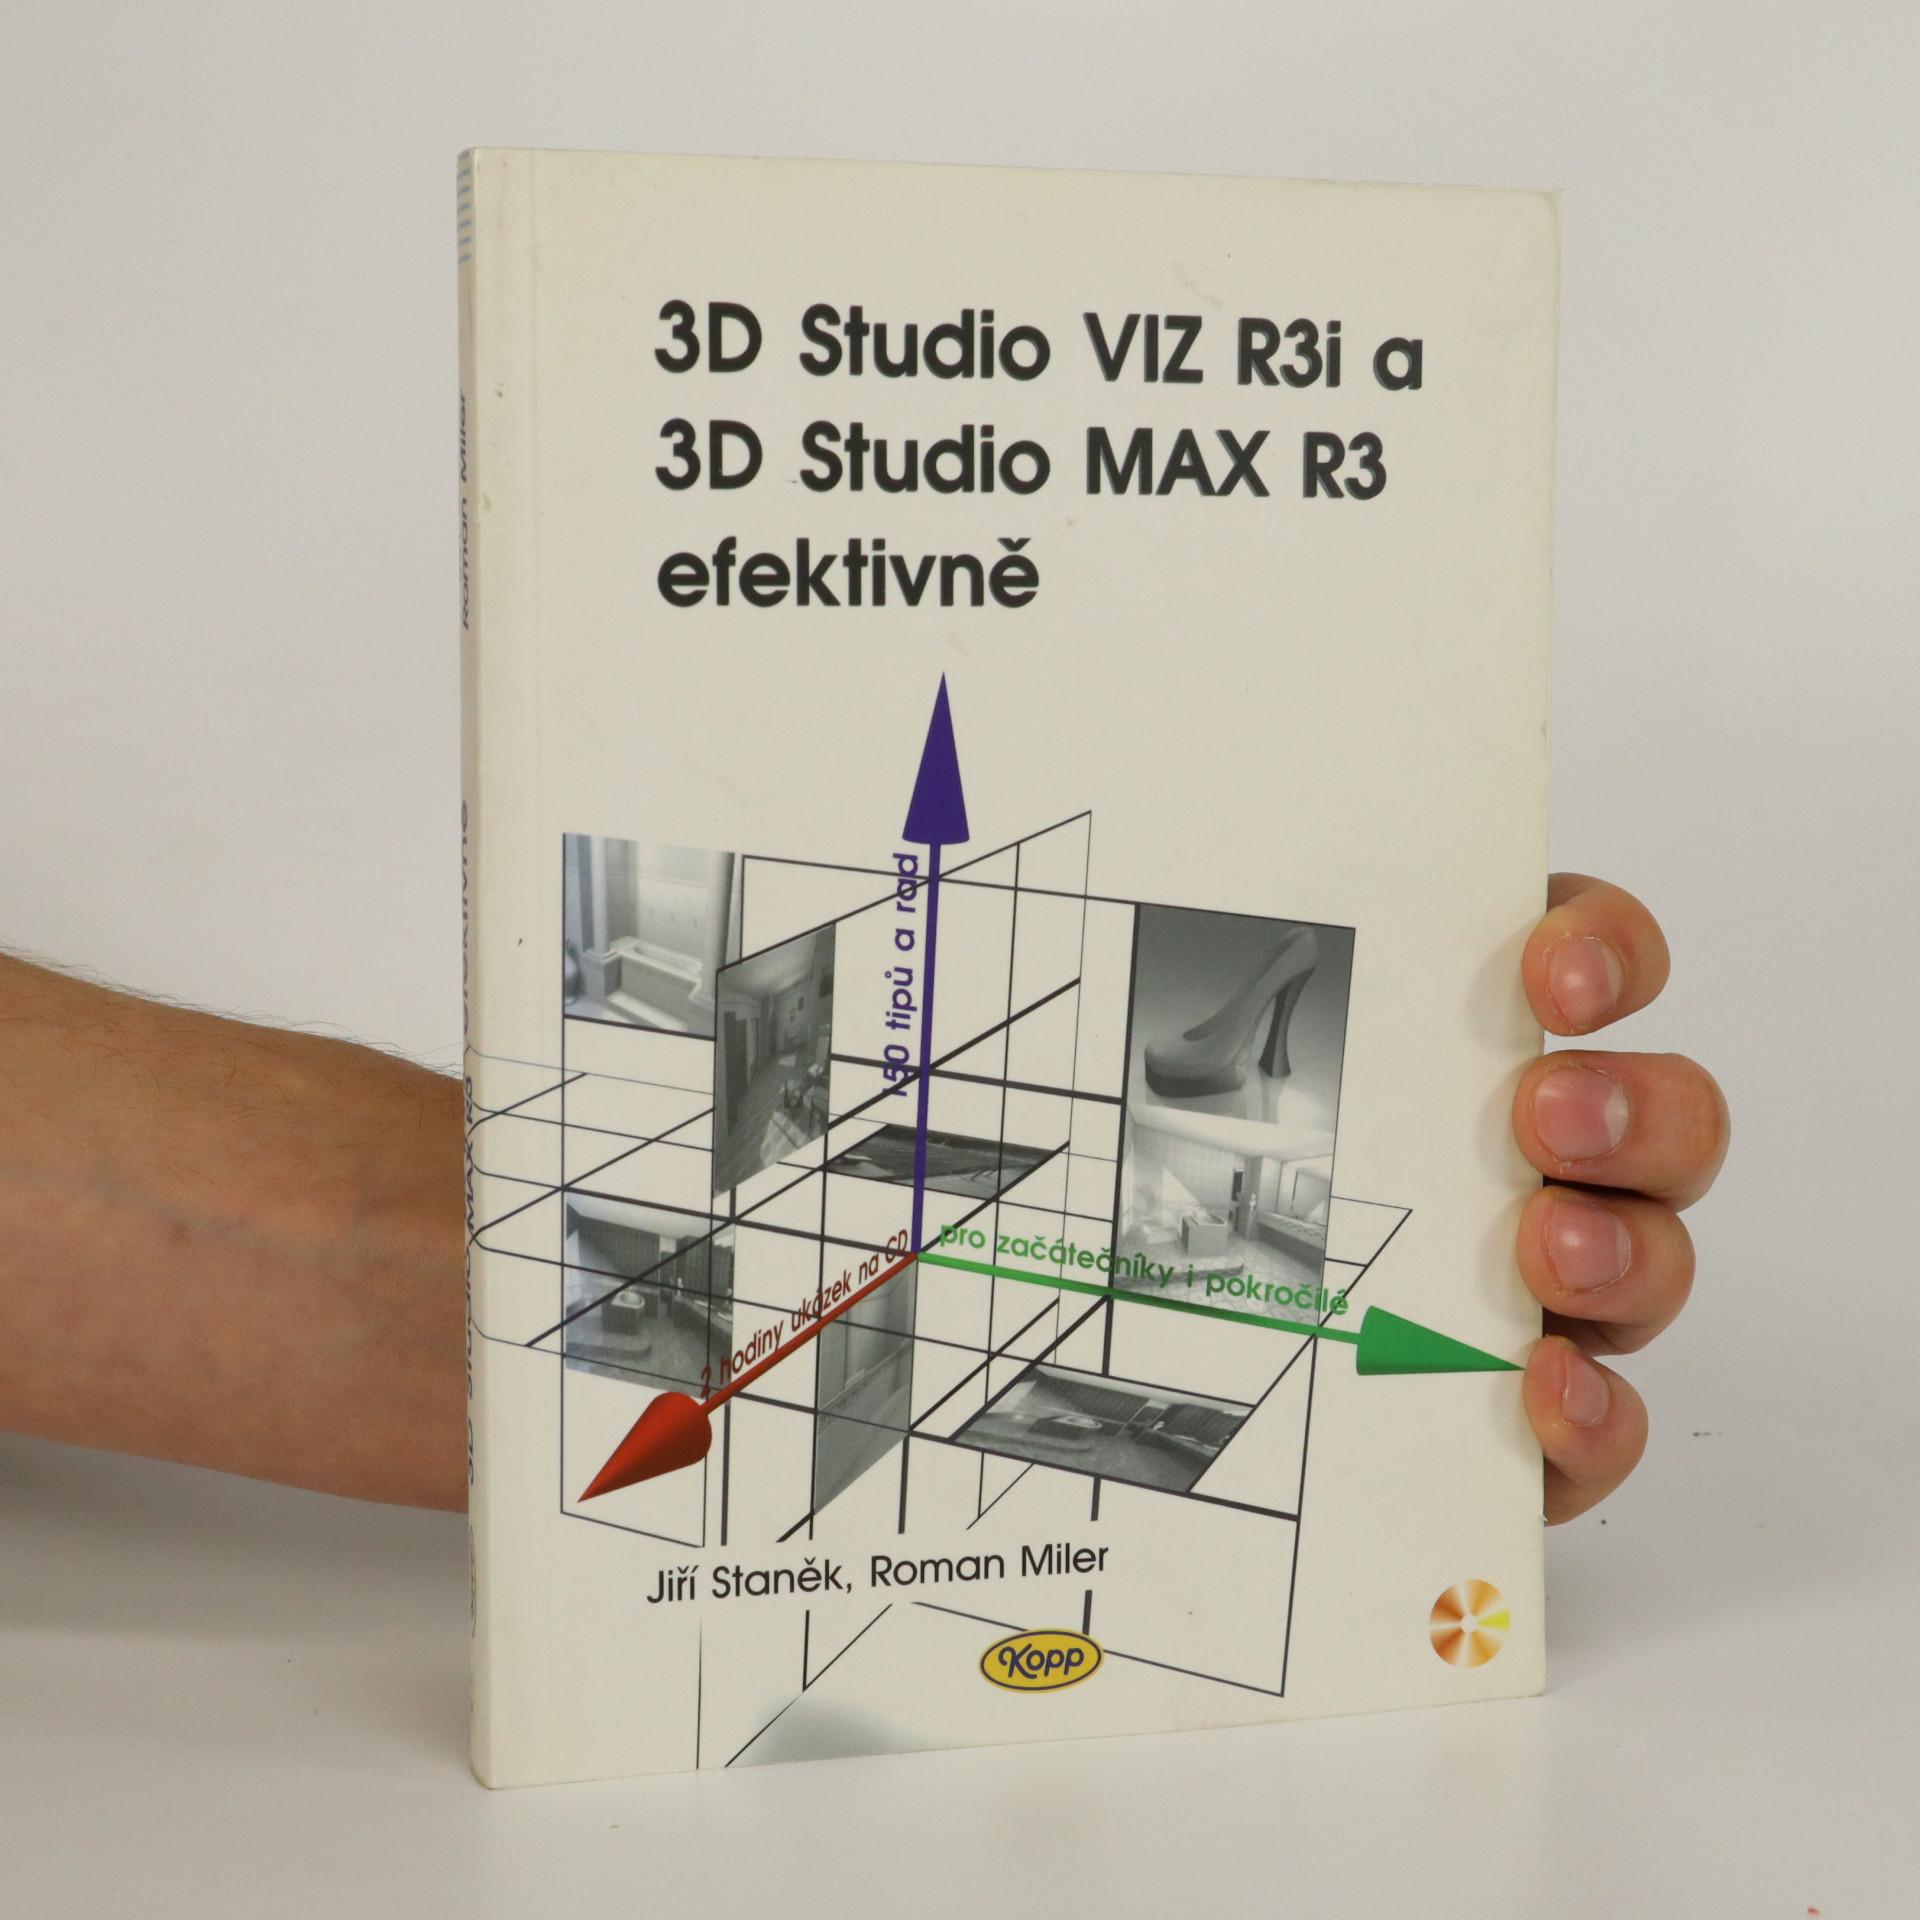 antikvární kniha 3D Studio VIZ R3i a 3D Studio MAX R3 efektivně, 2000